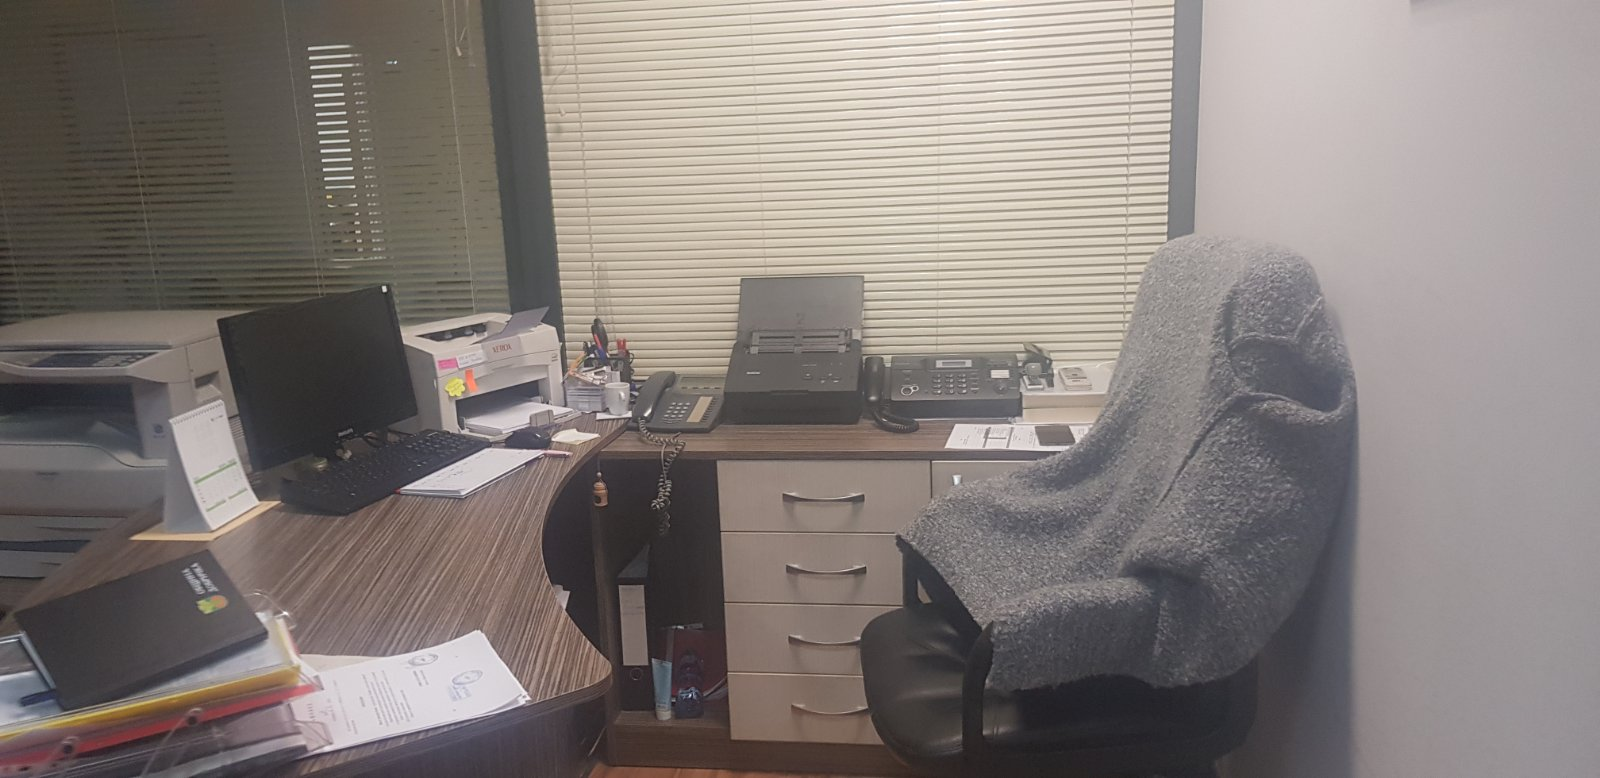 секретарка, балтаджиева